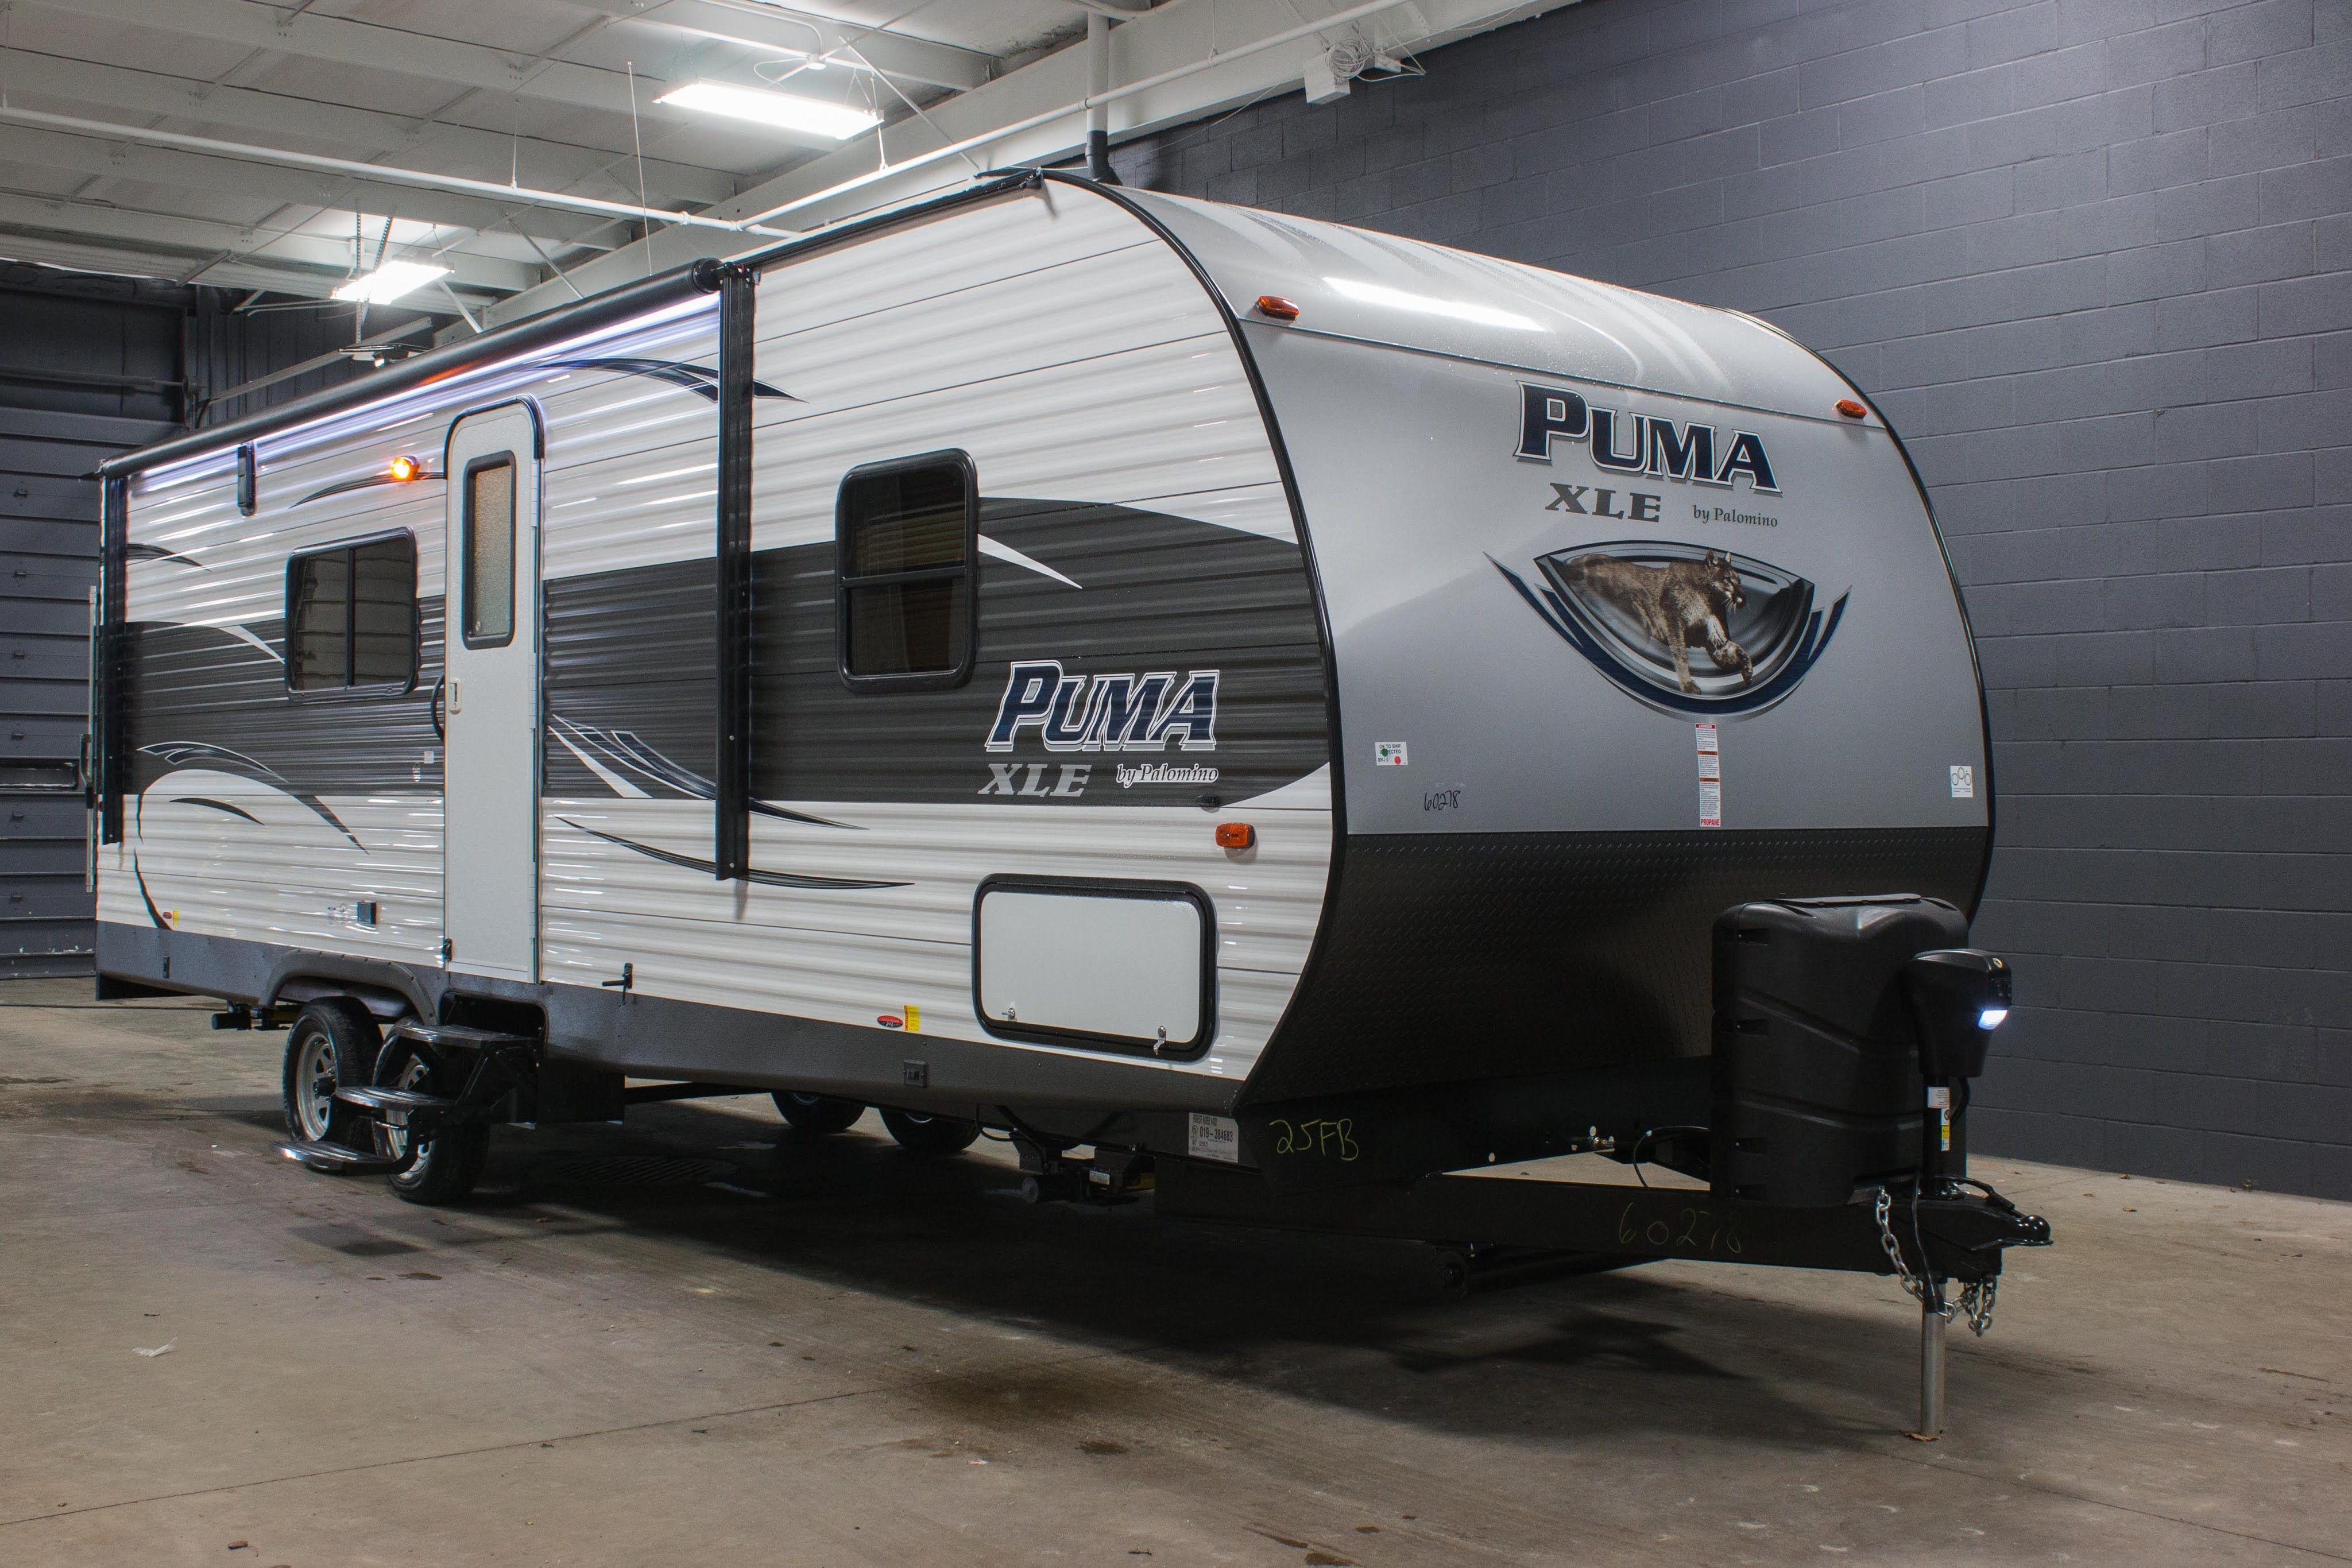 2016 Puma XLE 25FBC toy hauler travel trailer